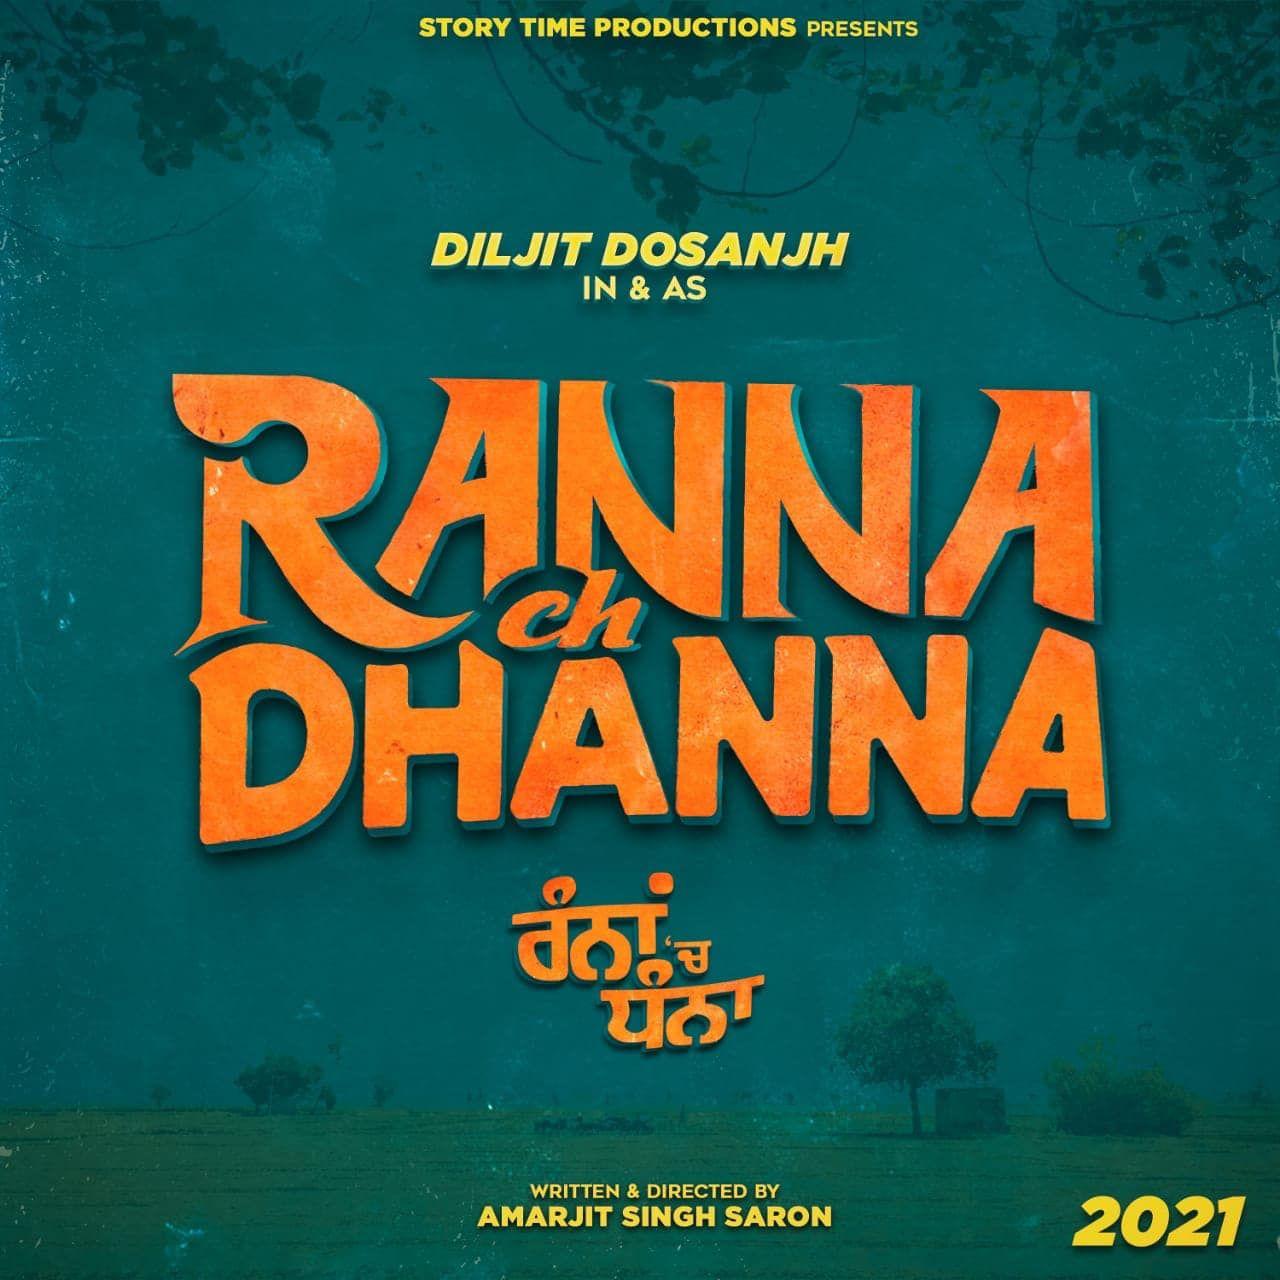 Diljit dosanjh announces new punjabi film ranna ch dhanna